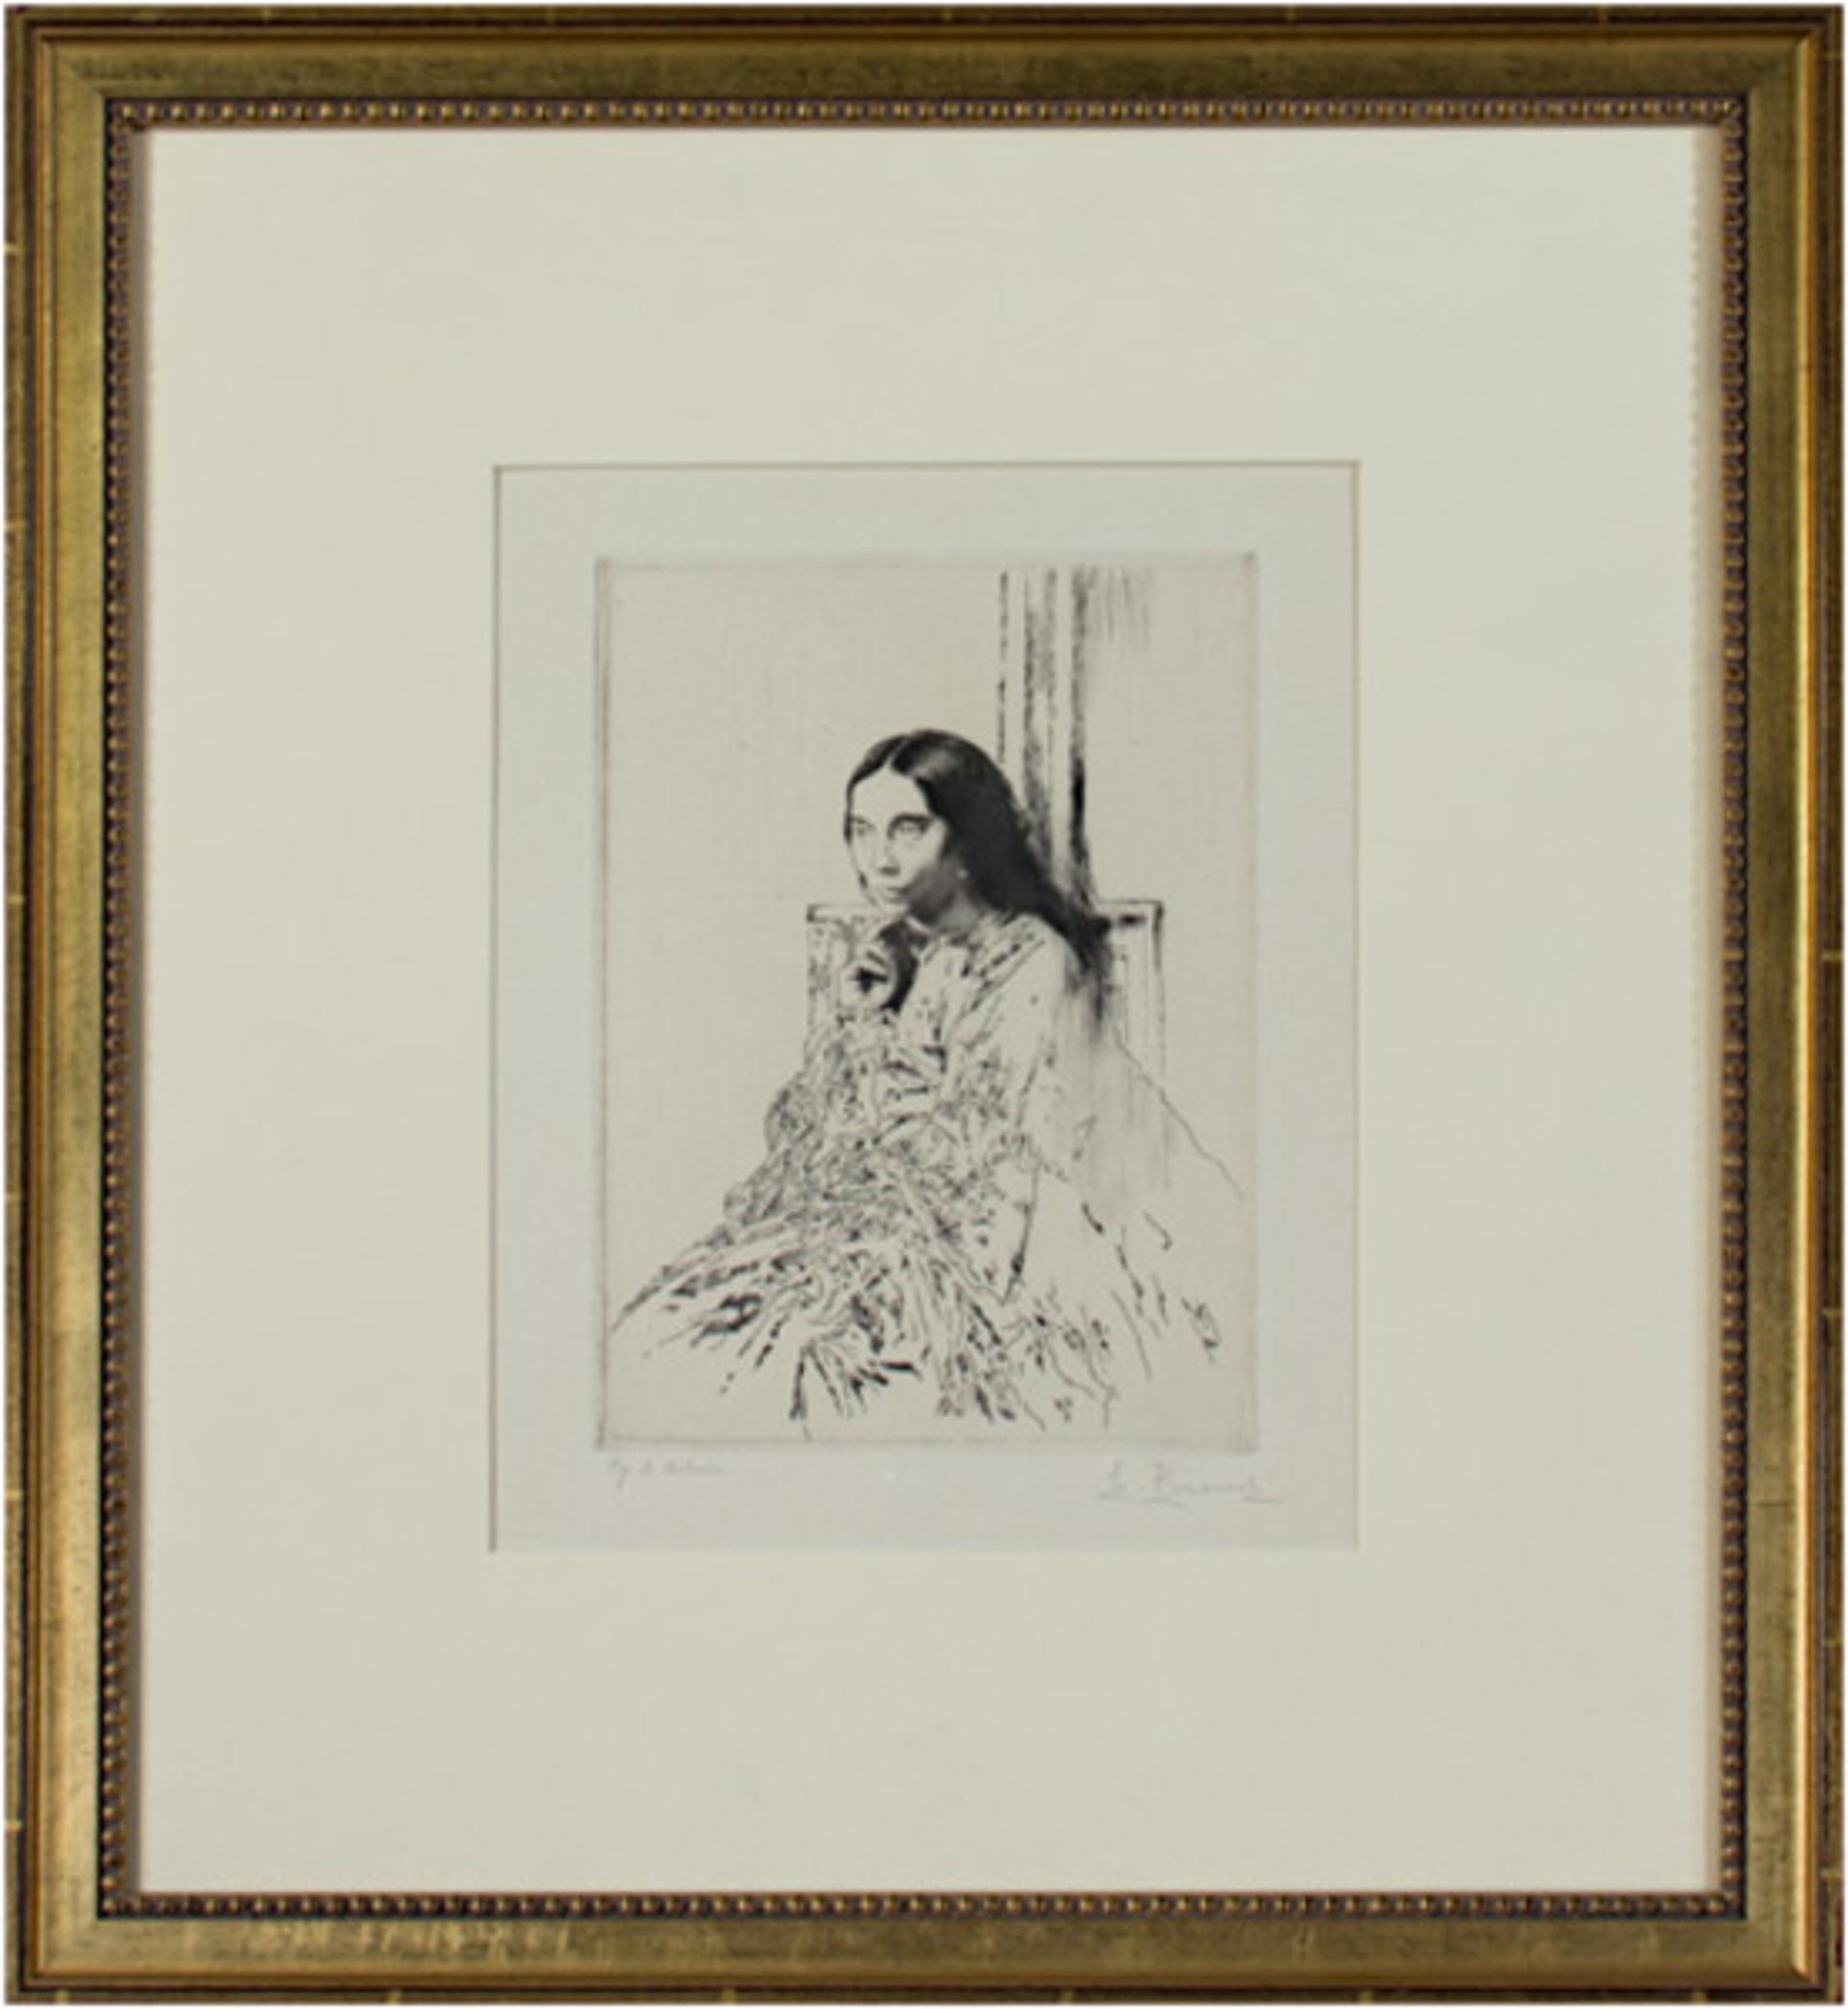 La Mere de Whistler by Auguste Brouet